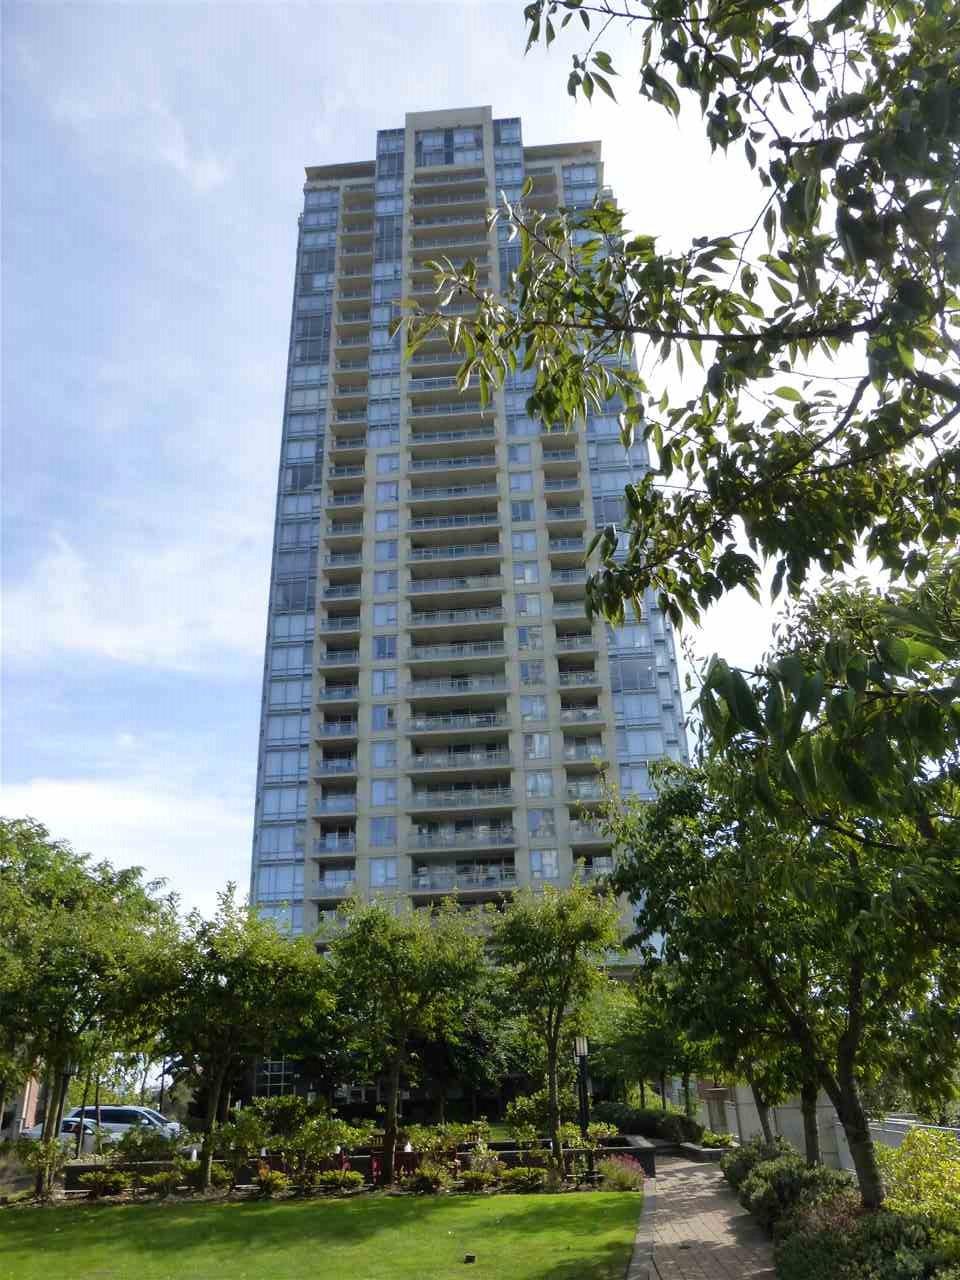 Condo Apartment at 1110 9888 CAMERON STREET, Unit 1110, Burnaby North, British Columbia. Image 1